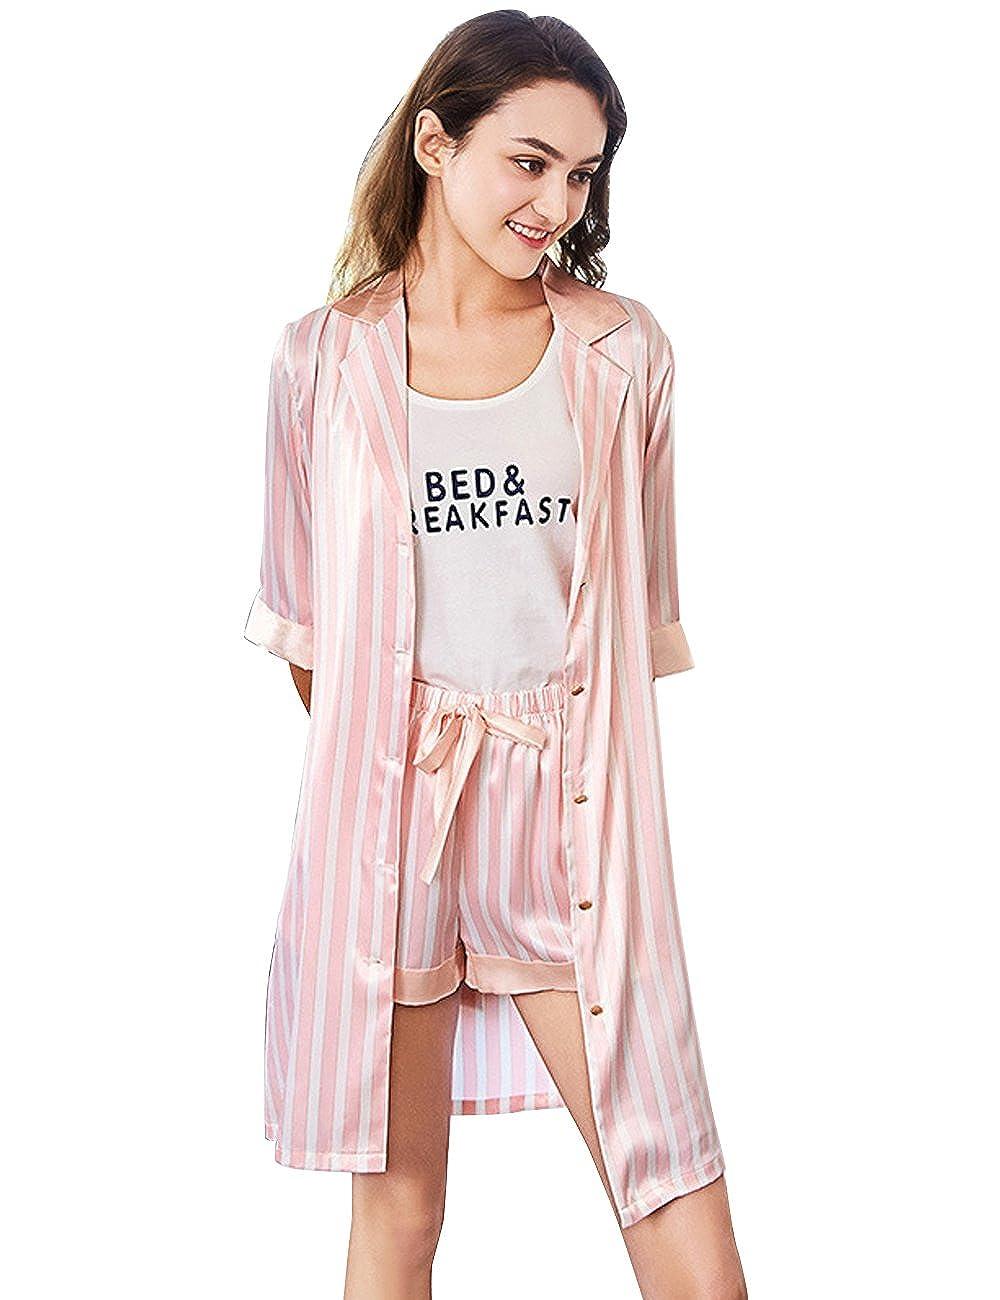 fa3872f77a911 Damen 3 4 Arm Sleepwear 3pcs Komfort Fit Top  Amazon.de  Bekleidung